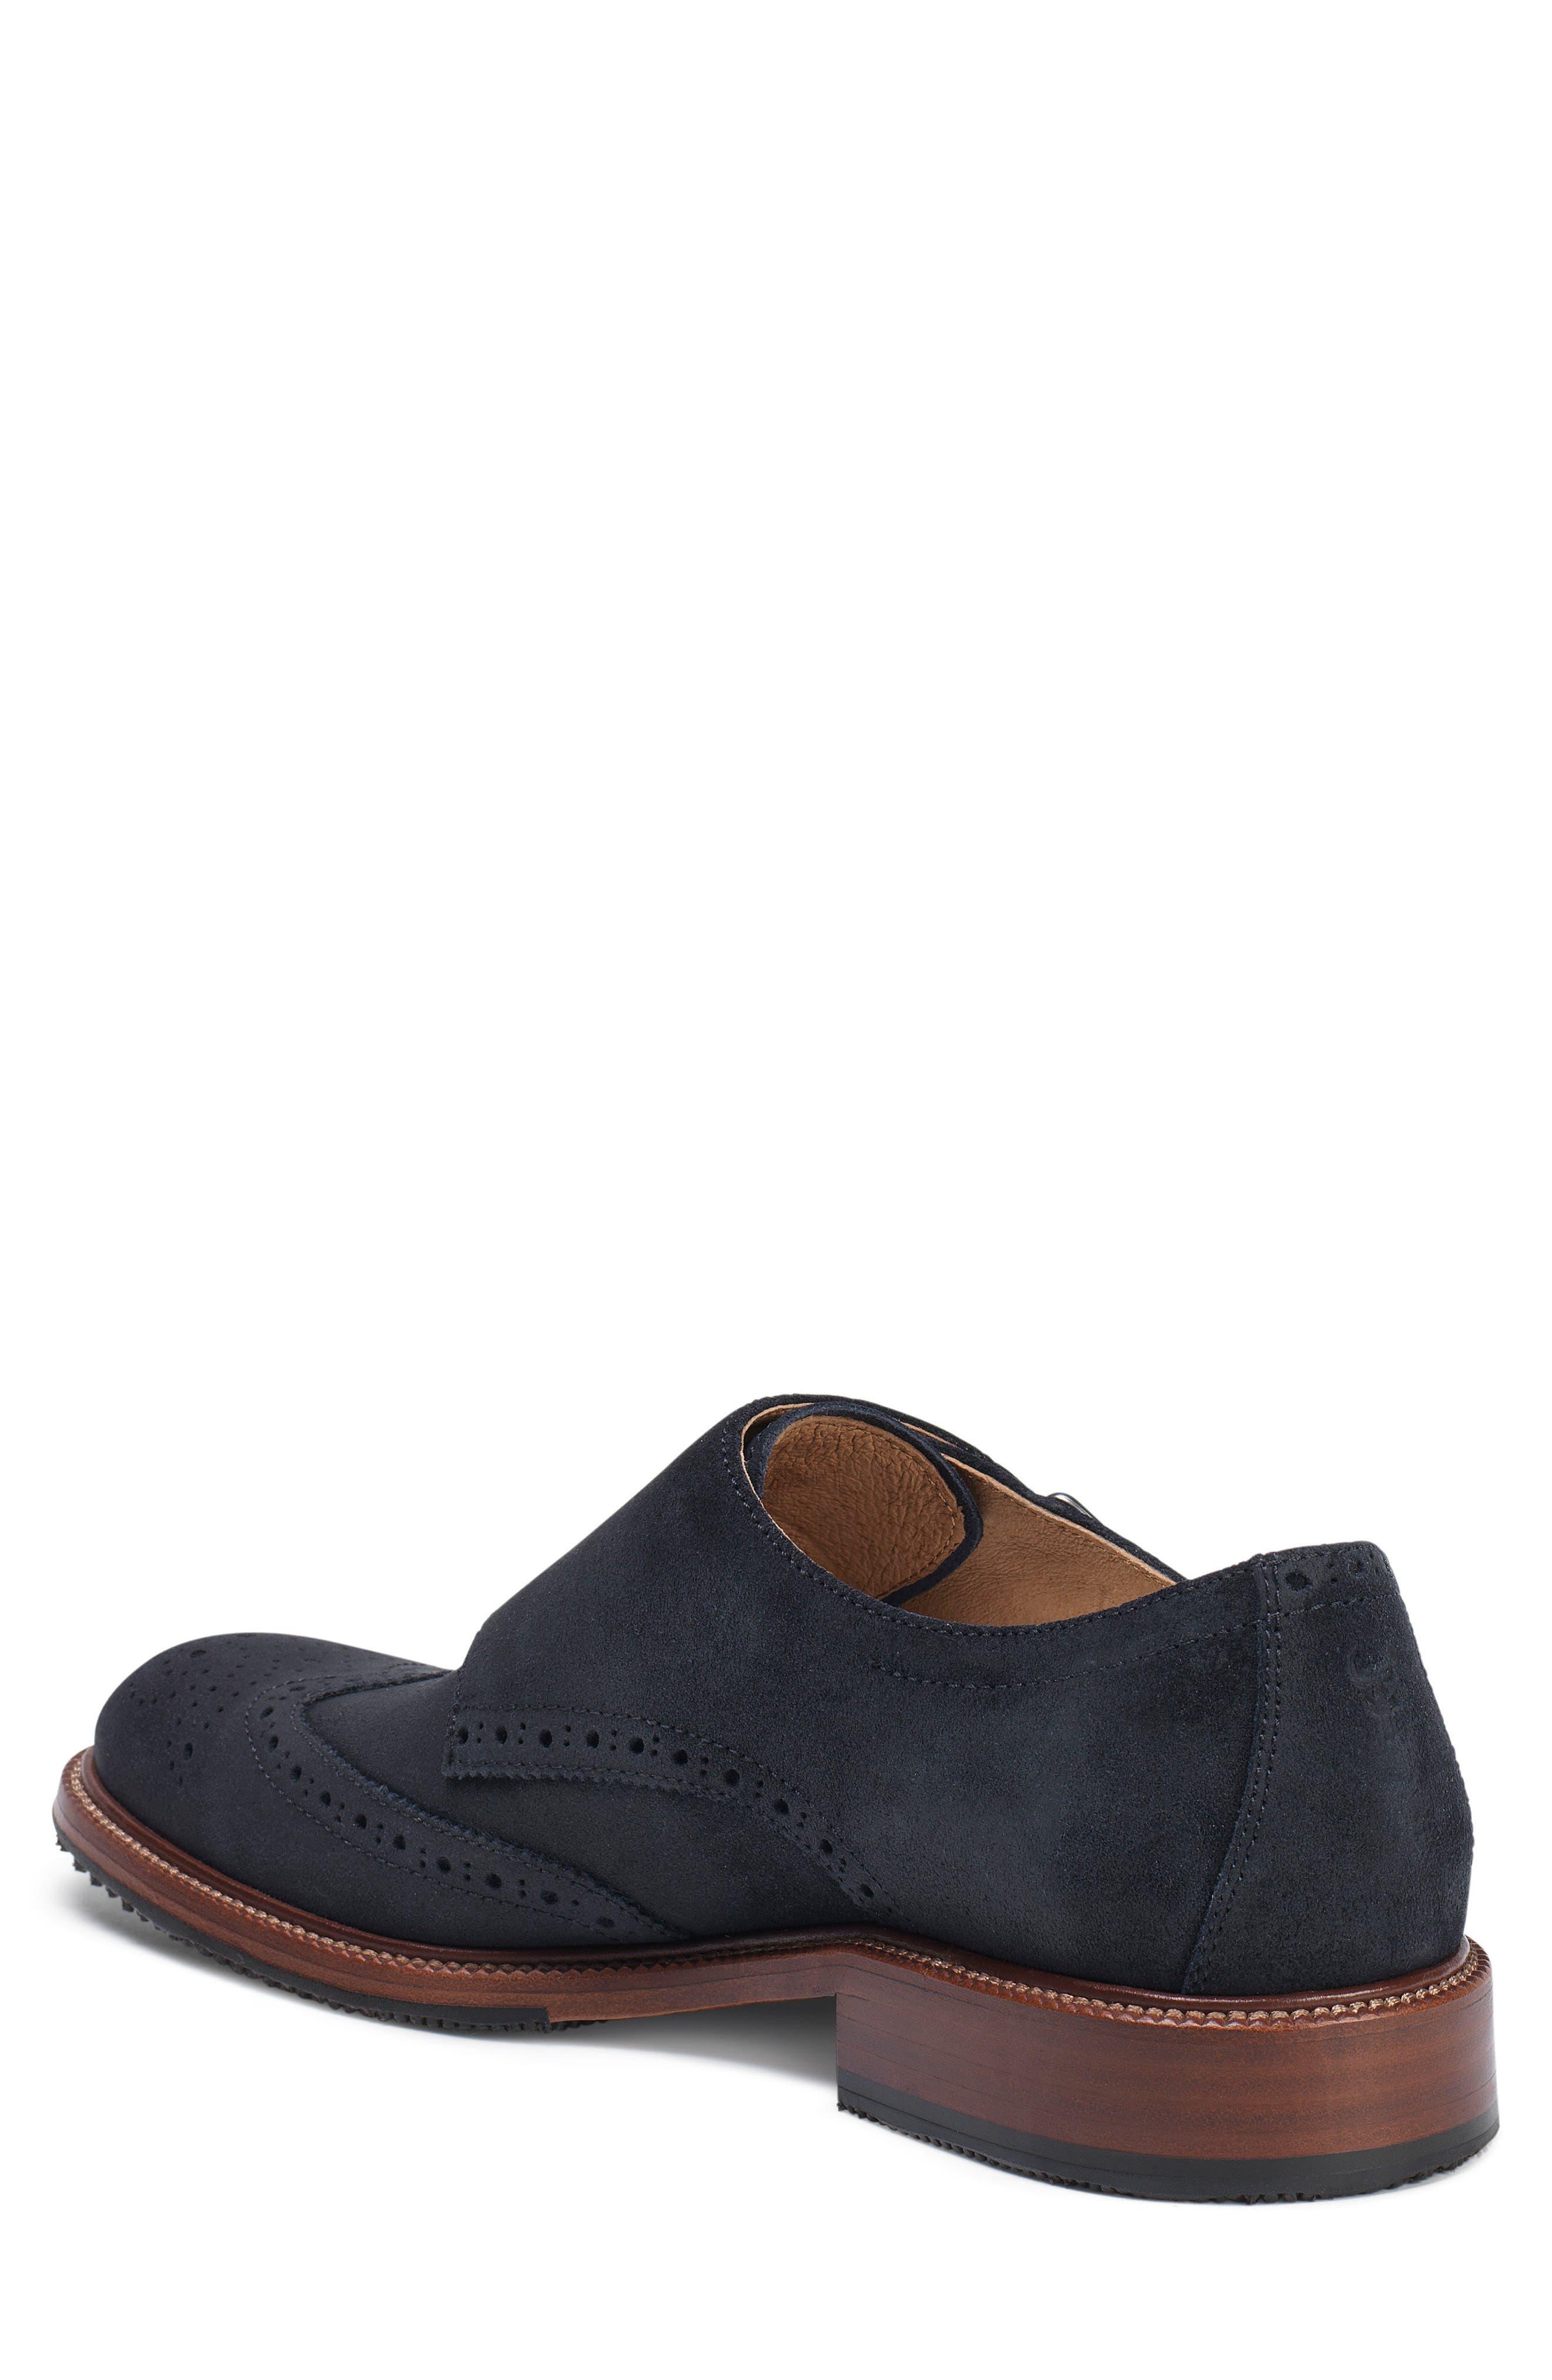 Leland Double Monk Strap Shoe,                             Alternate thumbnail 2, color,                             Navy Waxed Suede